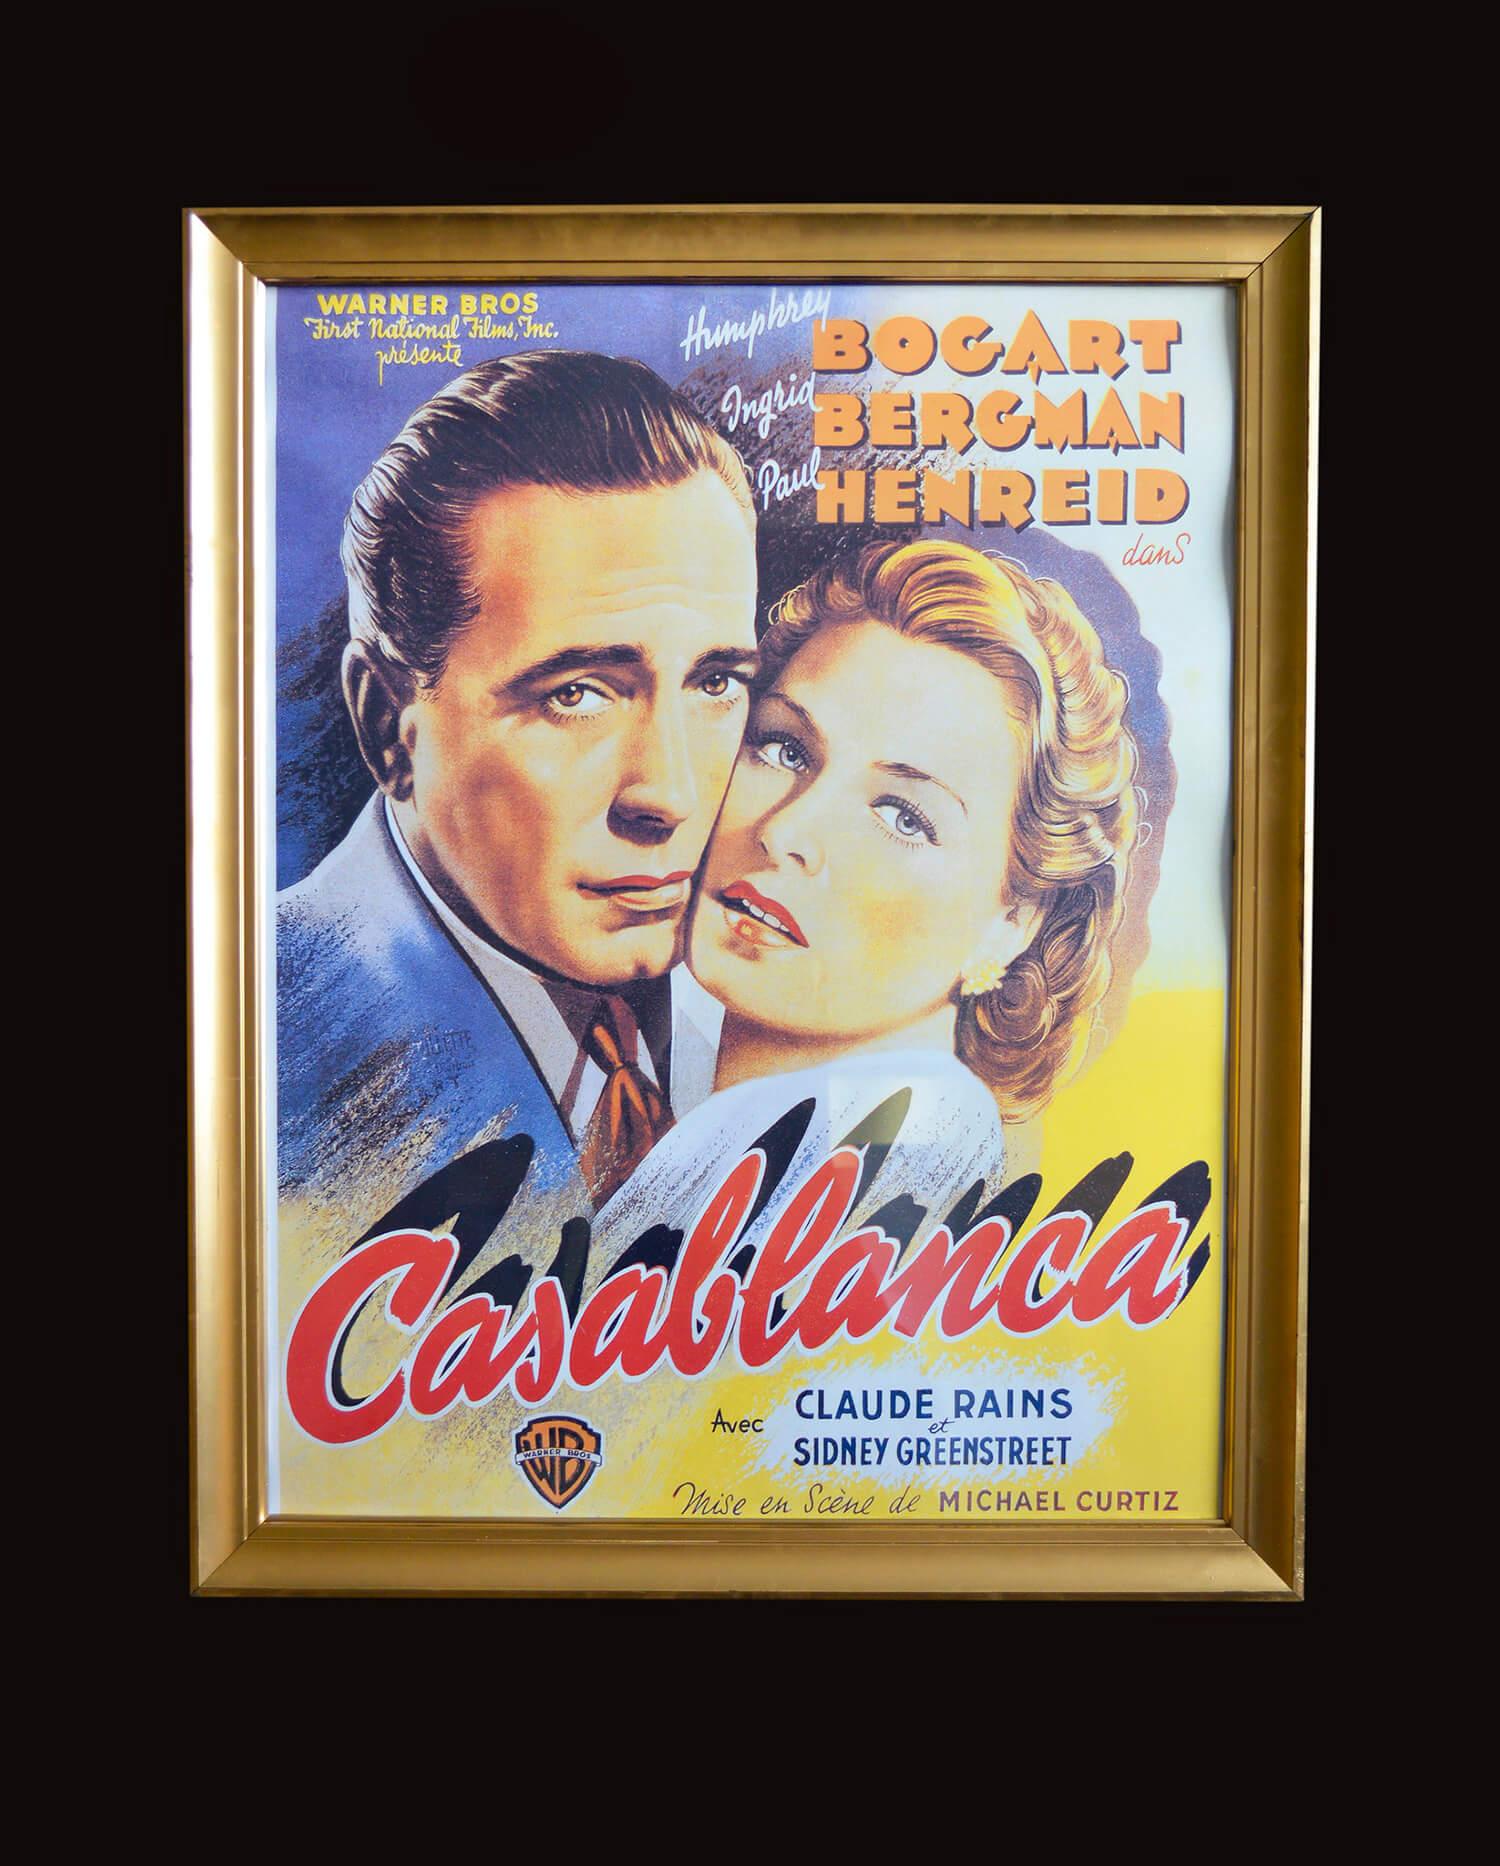 Sahara Desert Tour - Discover Casablanca - What to See and What to Do - Rick's Café